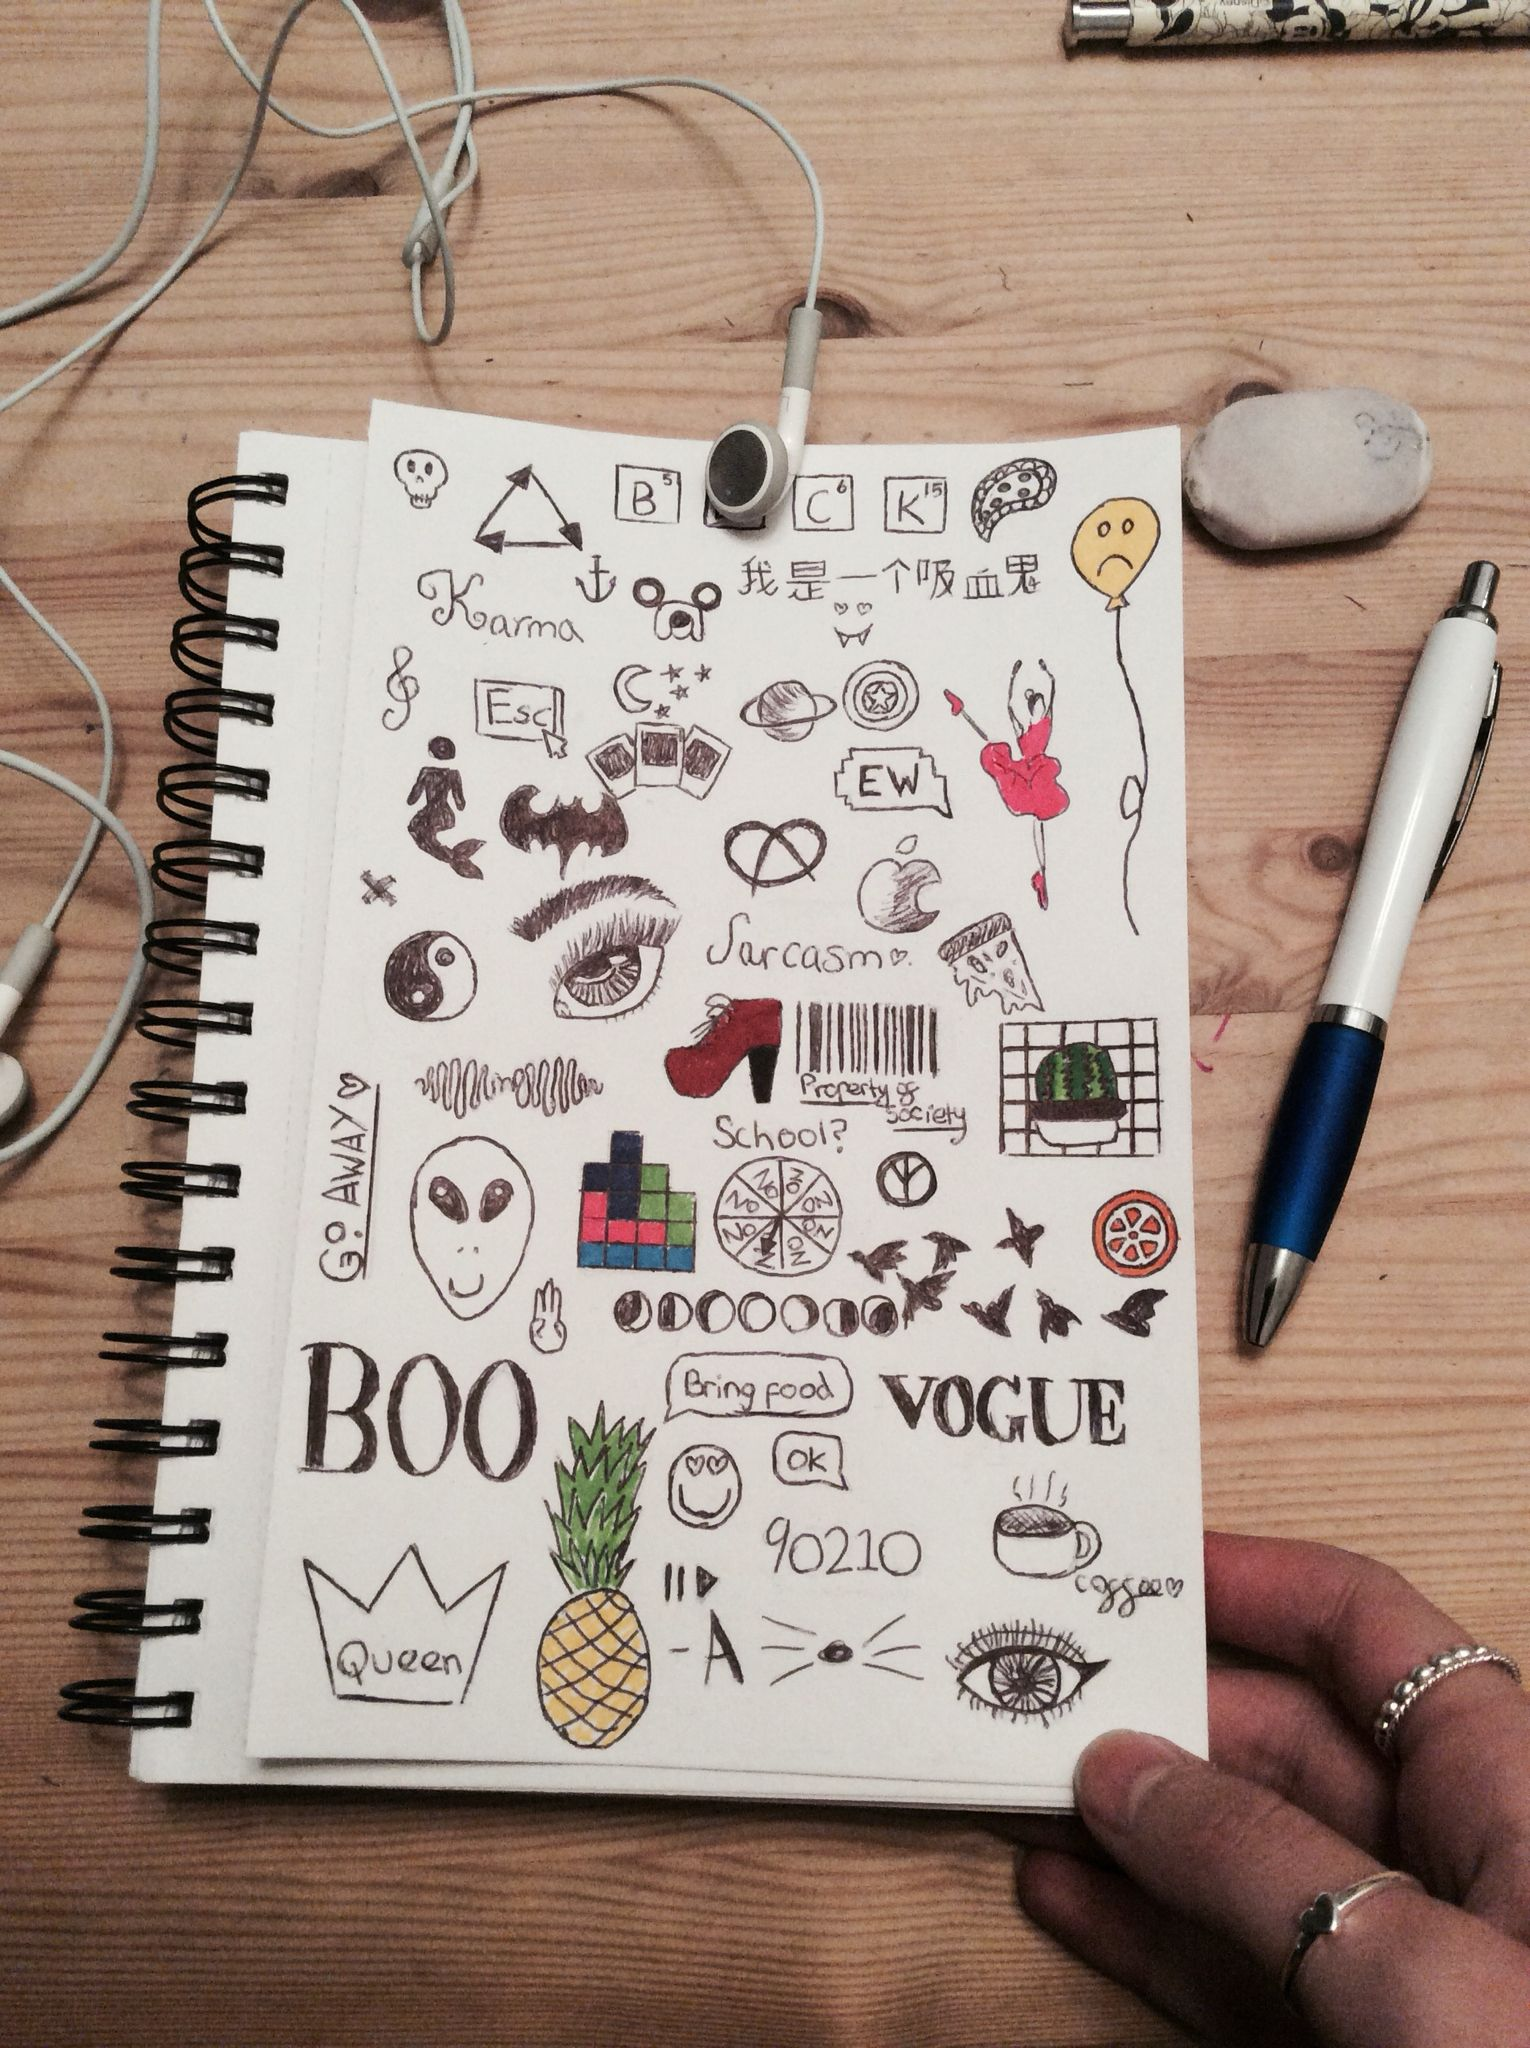 Doodles | Easy doodle art, Doodle art, Doodle art drawing